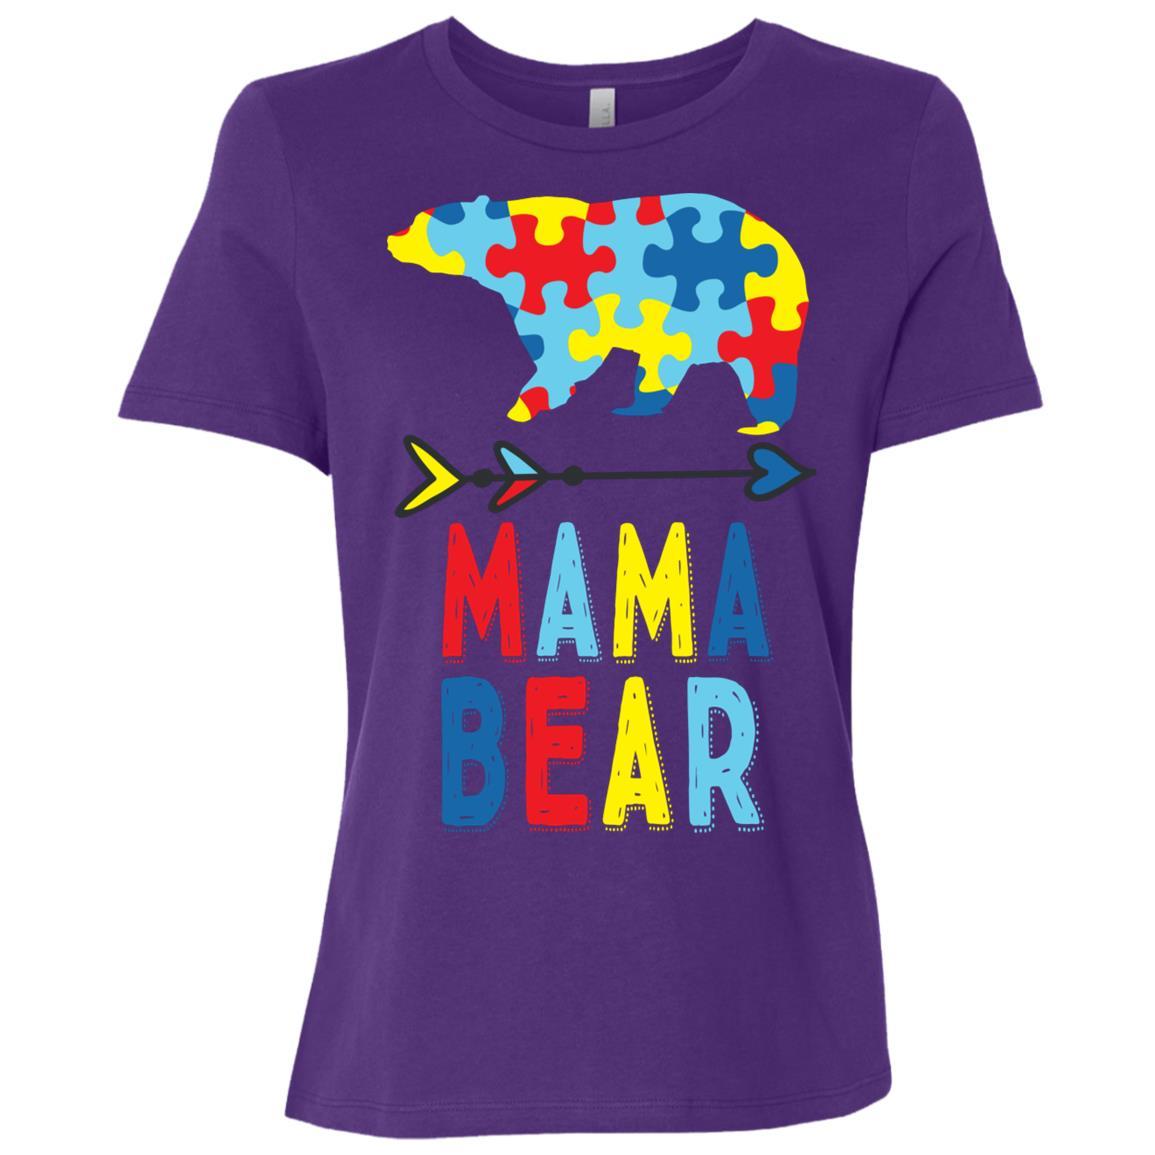 Mama Bear Autism Mom Gift Autism Awareness Women Short Sleeve T-Shirt